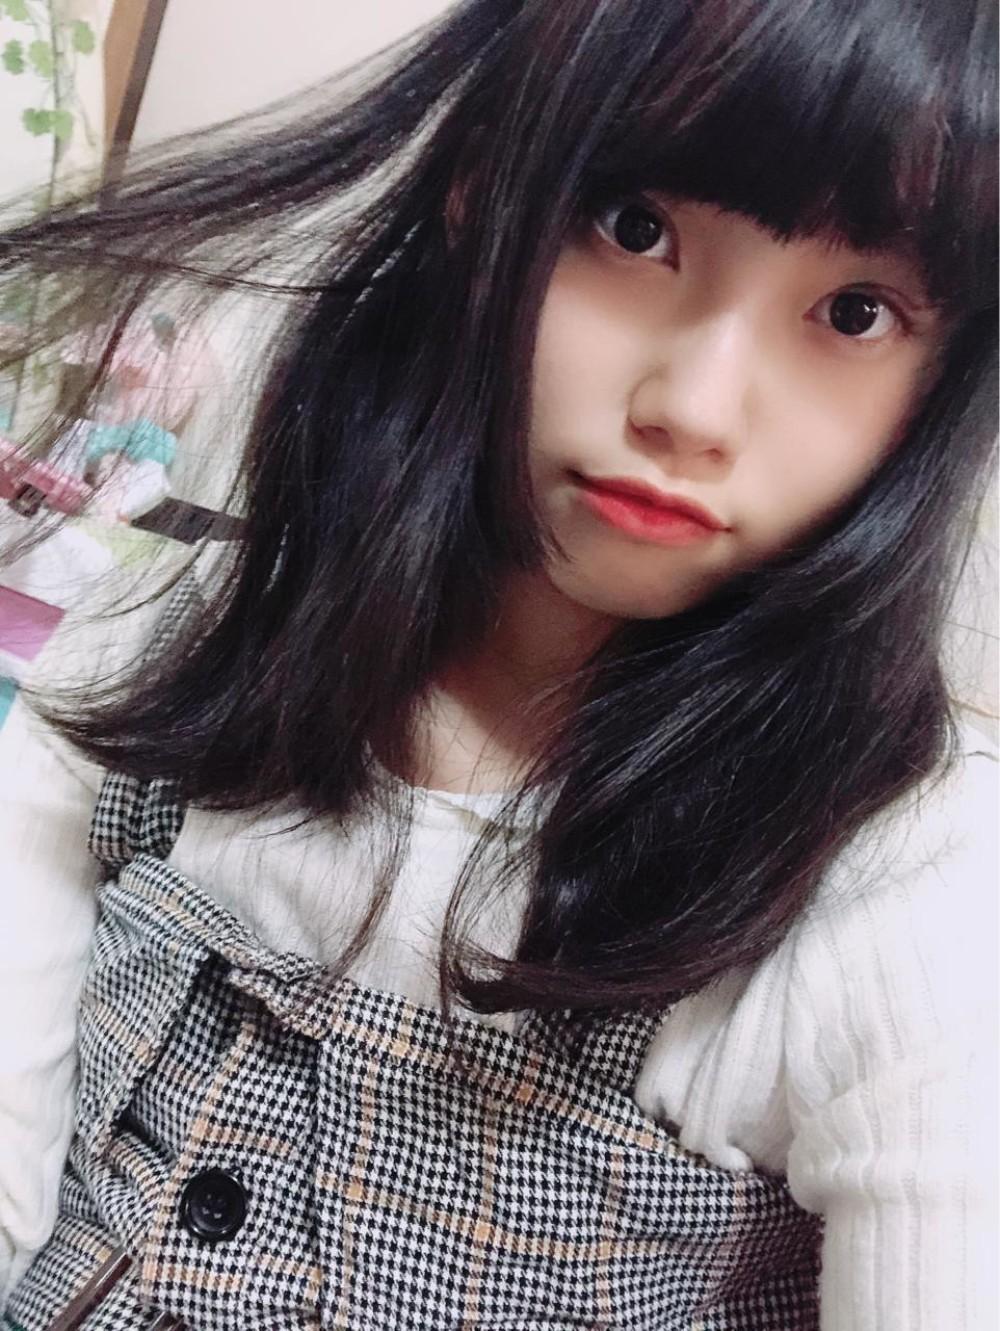 Nay_@でんぱ組虹コンオーディション(でんぱ組虹コンオーディション )